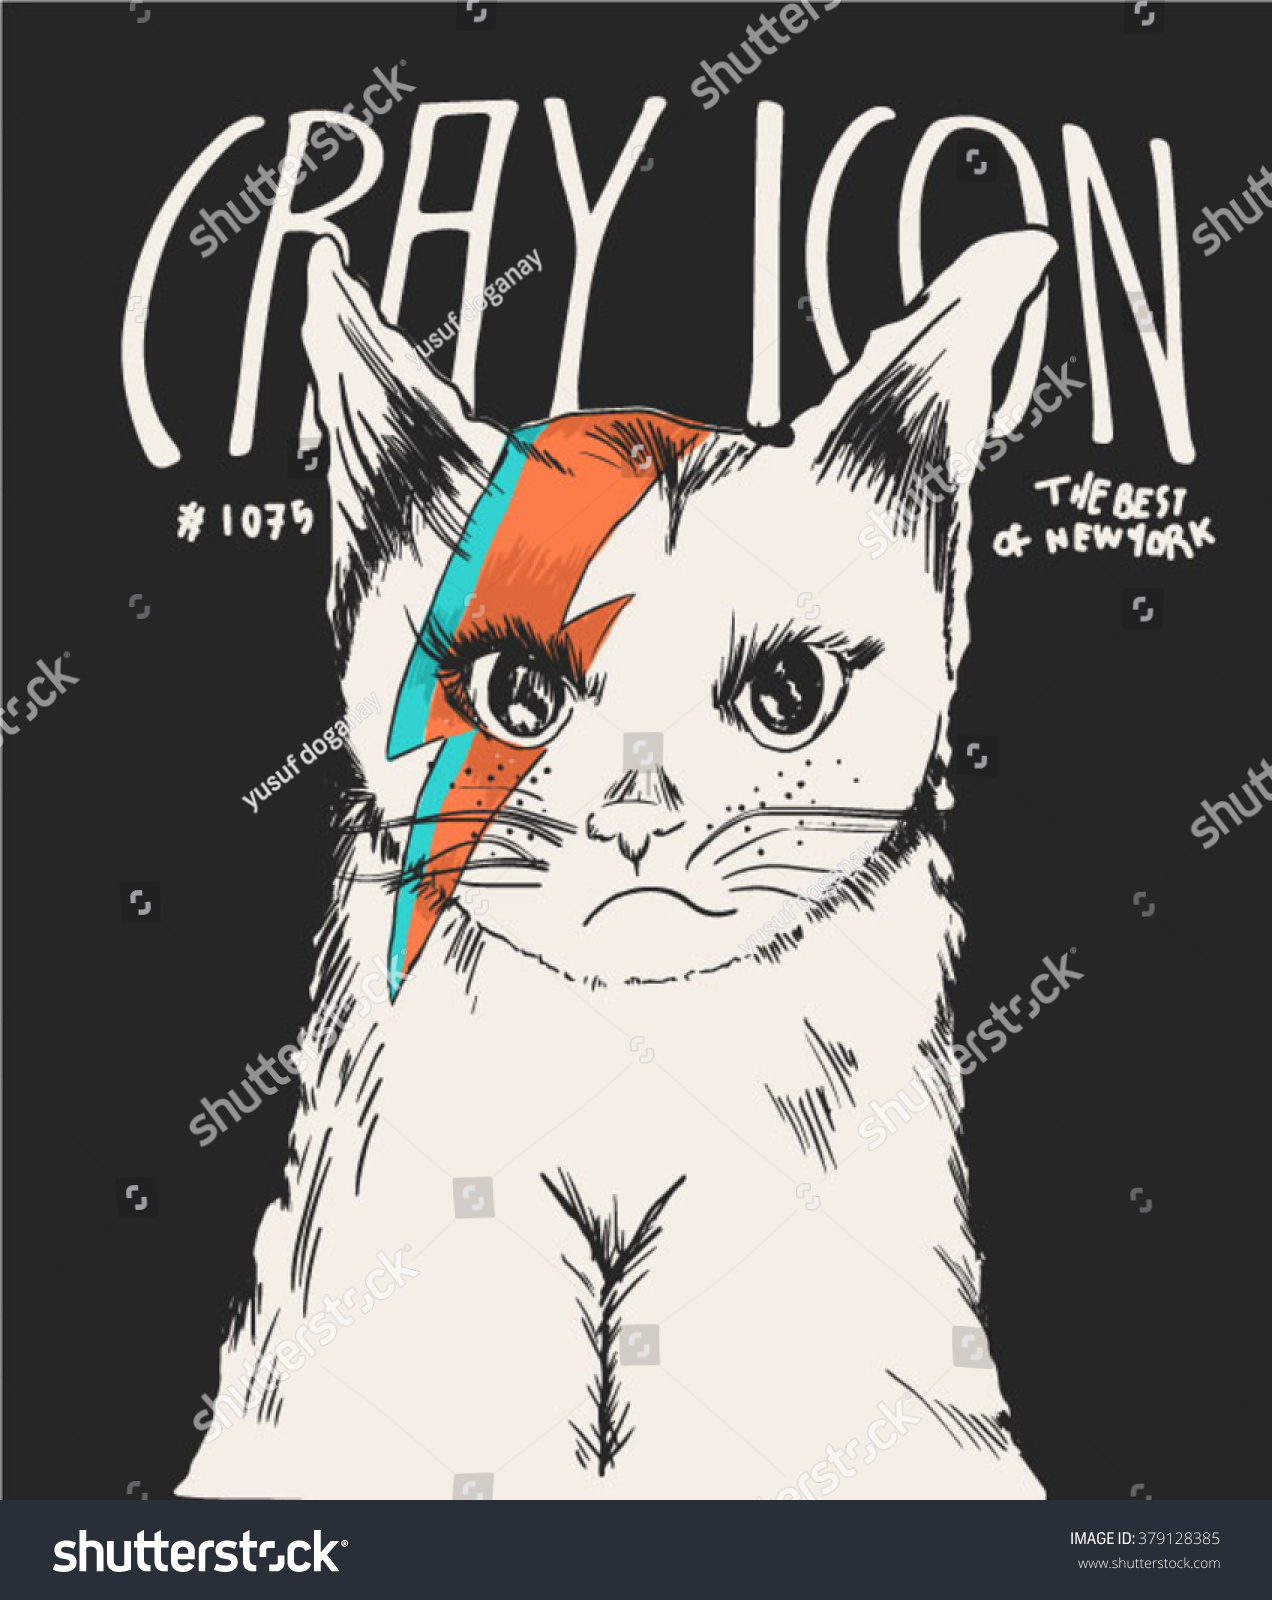 cutie fashion cat illustration